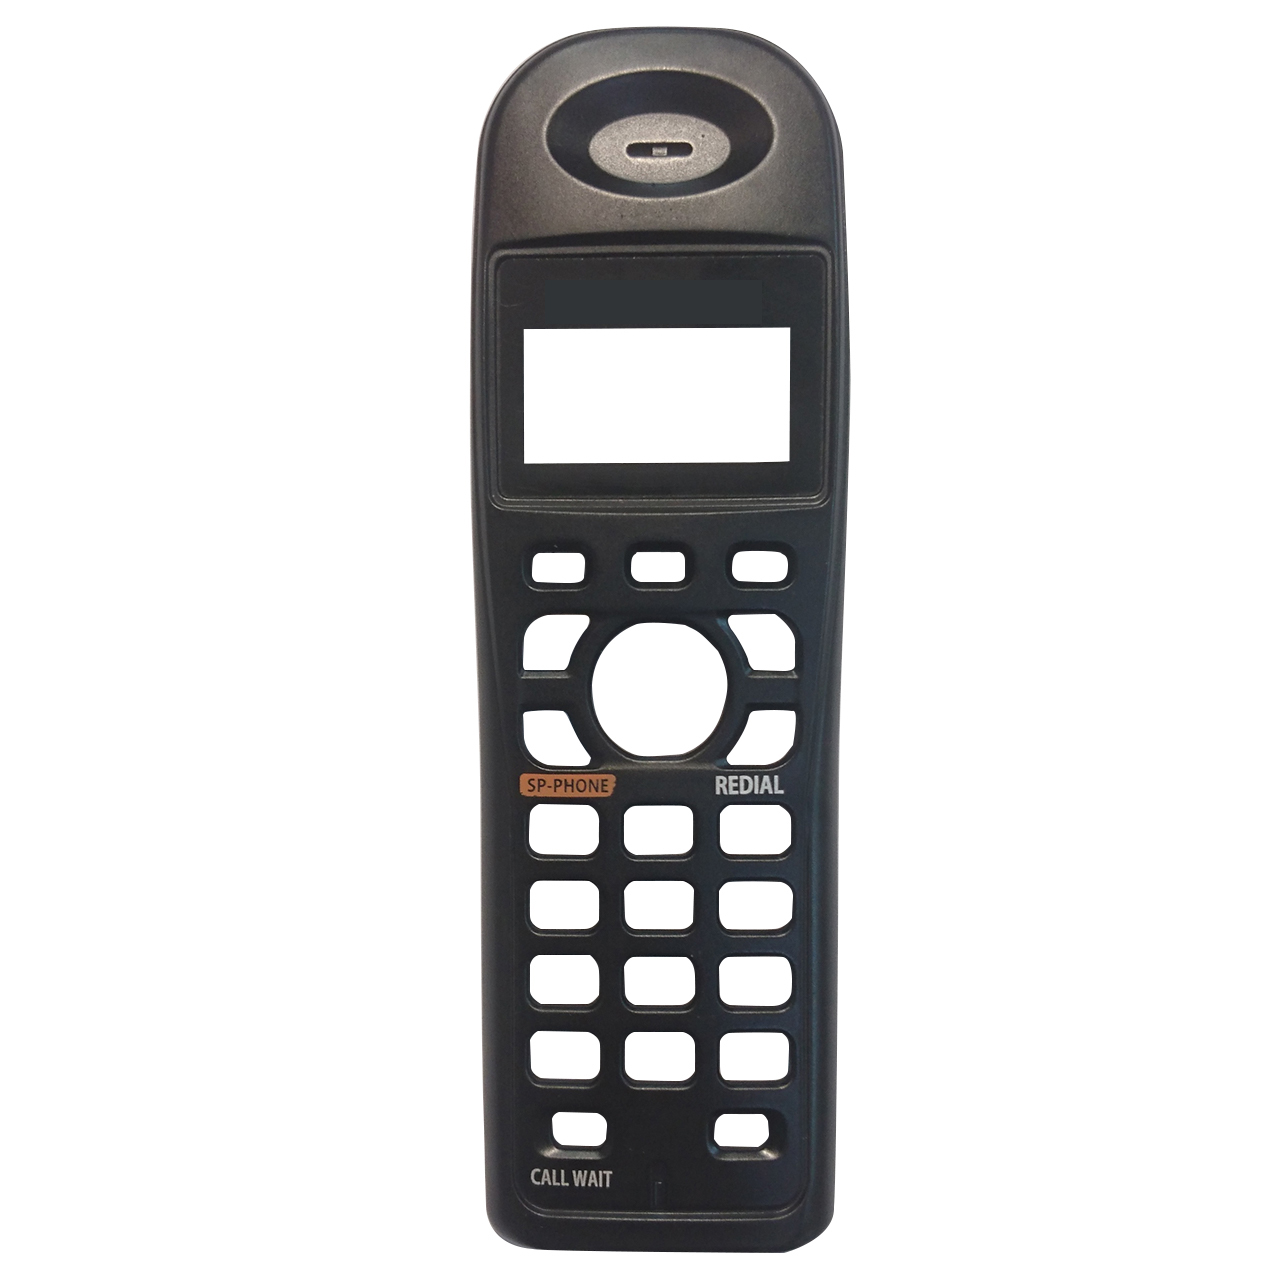 تصویر قاب یدکی تلفن بی سیم مدل gh-3611 مناسب تلفن پاناسونیک مدل kx-tg3611